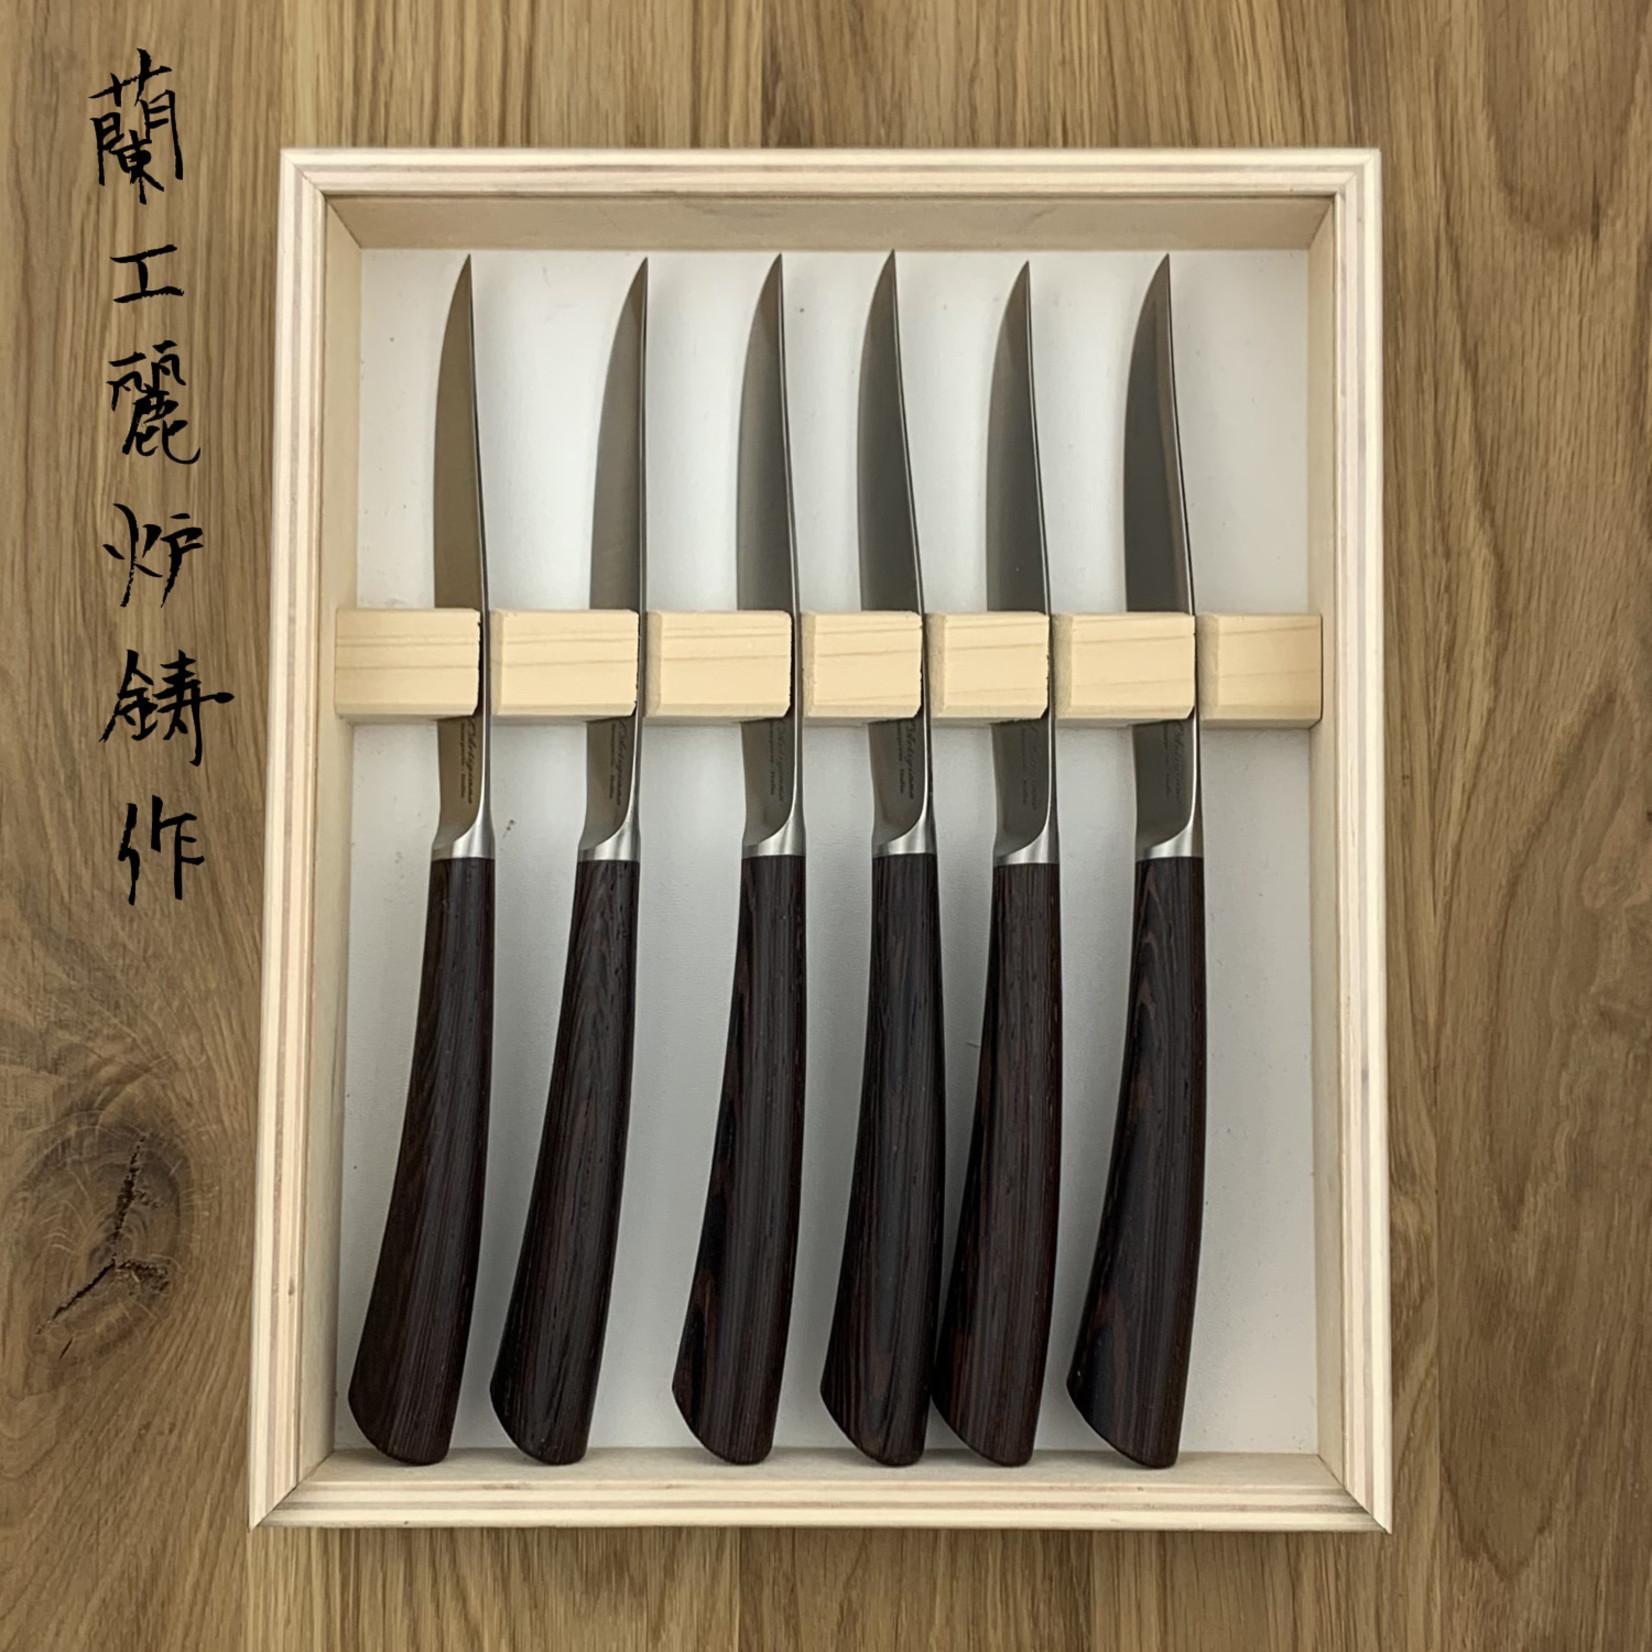 L'ARTIGIANO SCARPERIA Nobile steak knives set wenge (6 items)